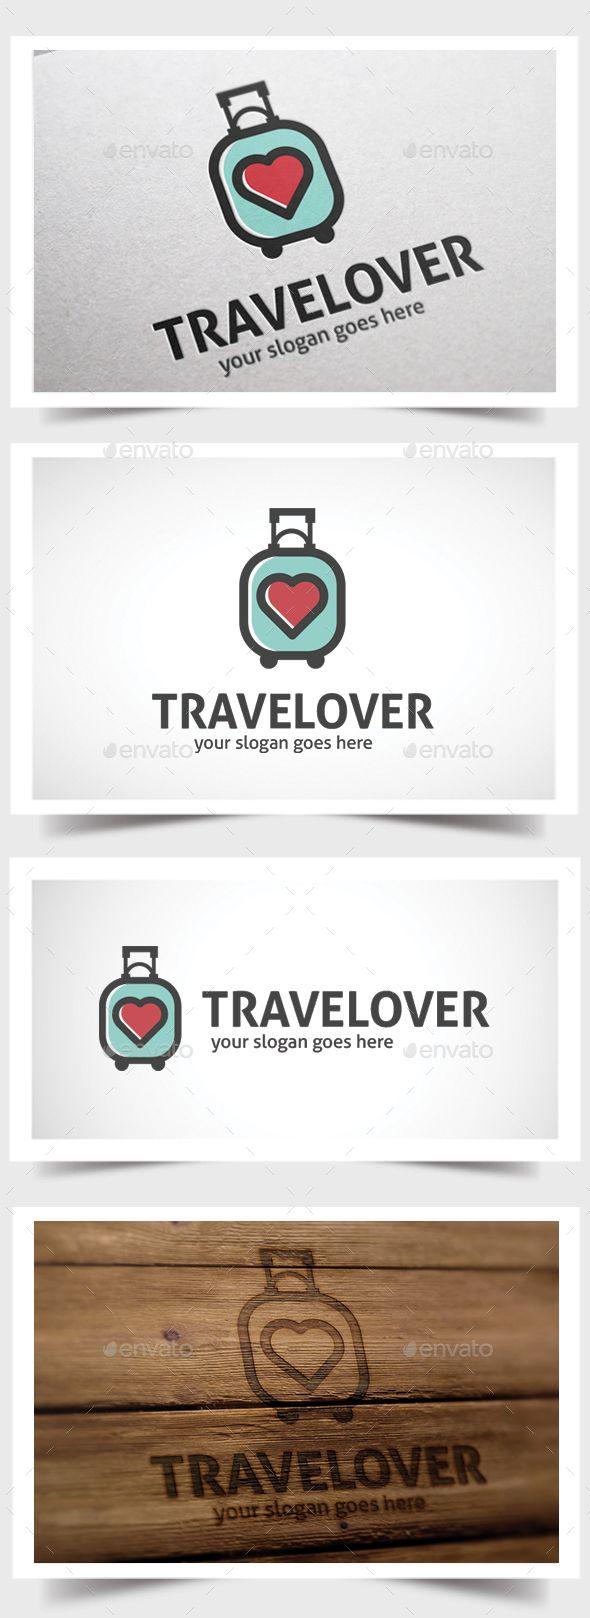 Travelover - Logo Design Template Vector #logotype Download it here: http://graphicriver.net/item/travelover/15587162?s_rank=1190?ref=nesto